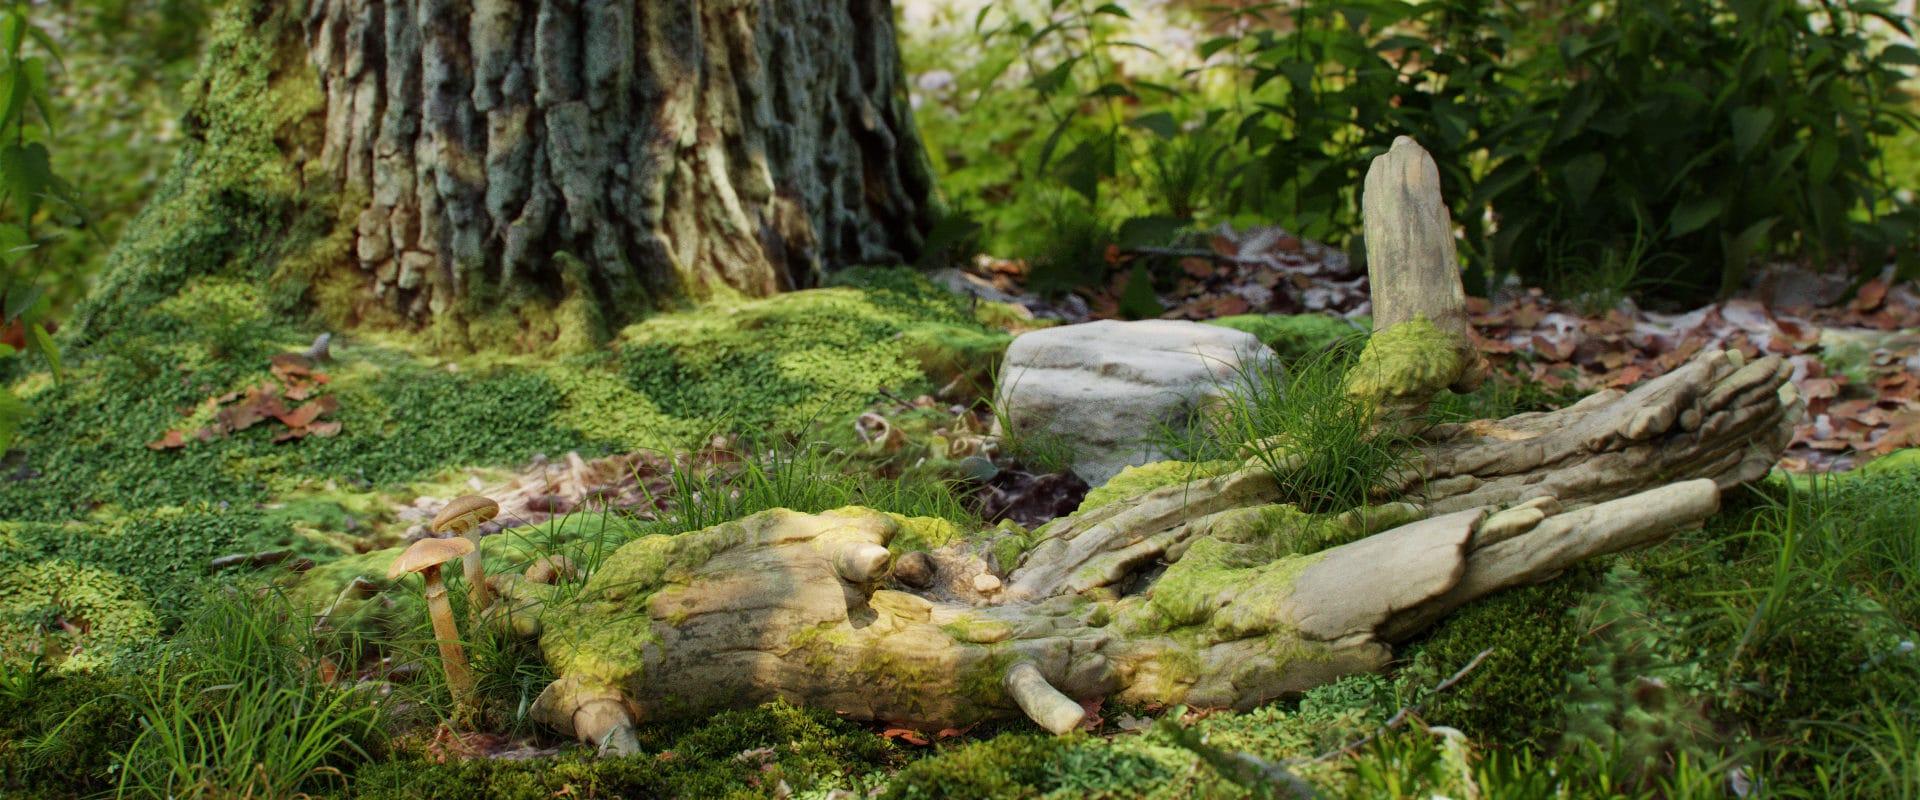 Wood_piece_360_15_9